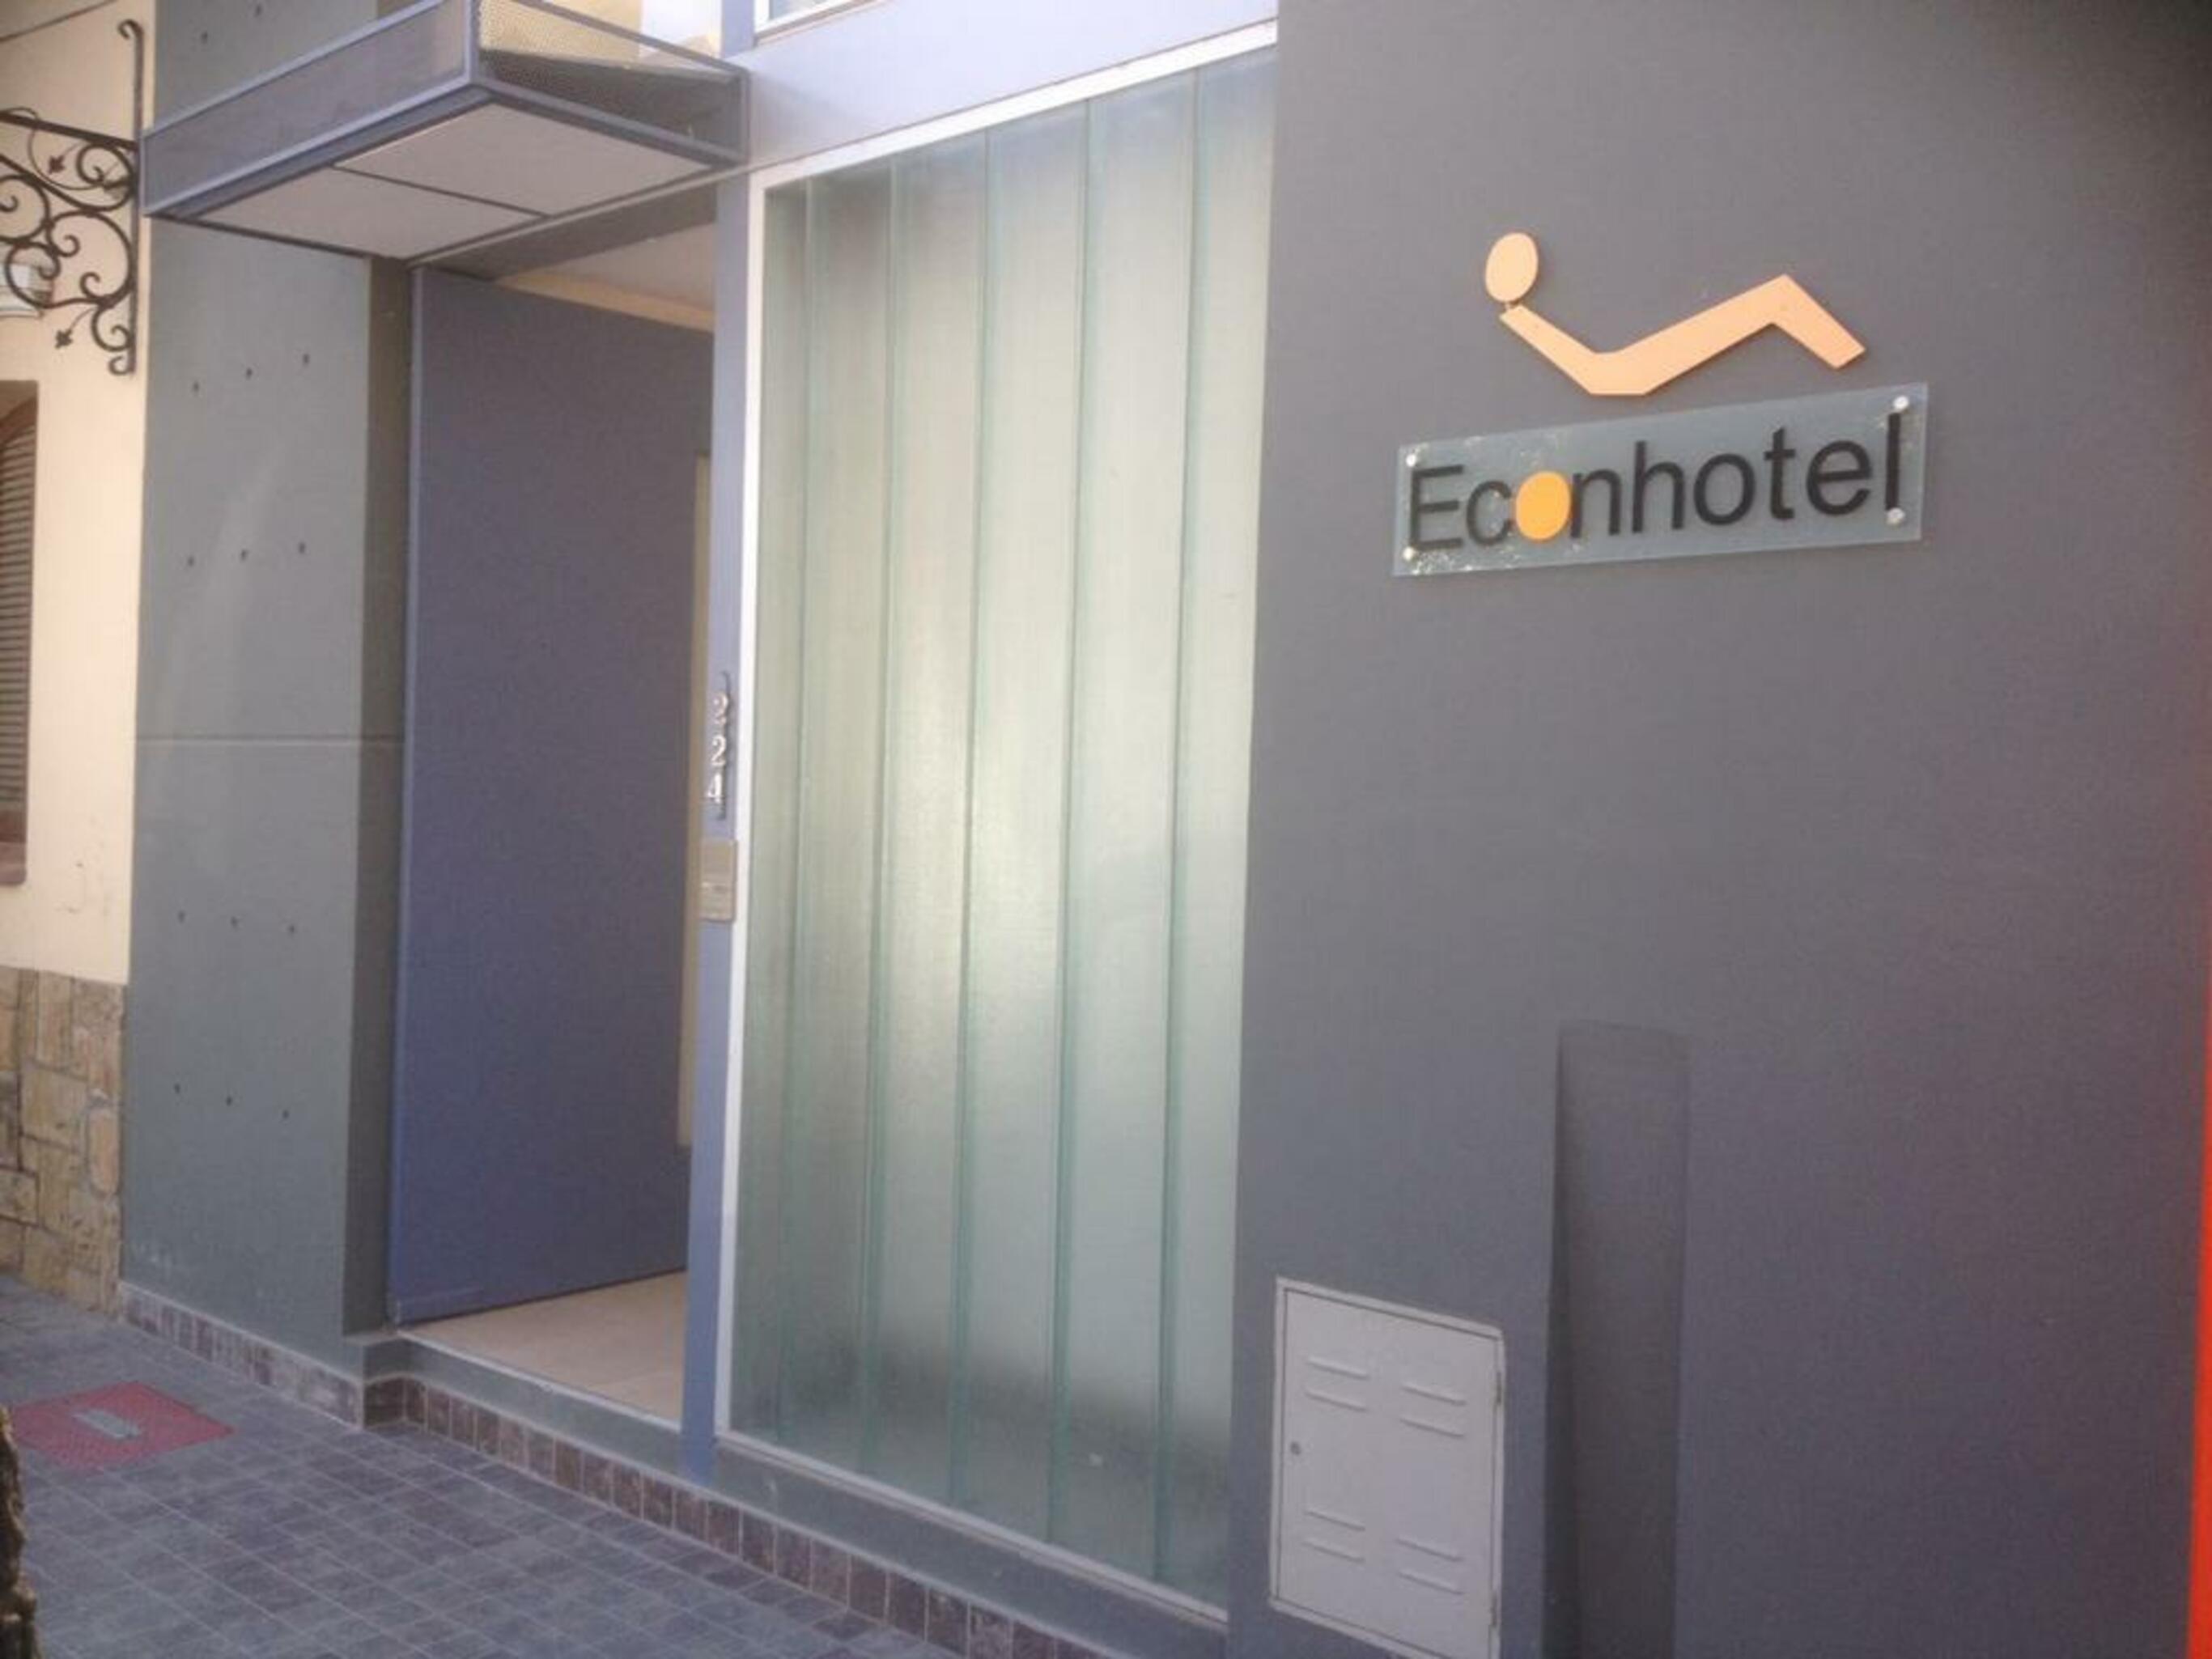 Econhotel, Capital